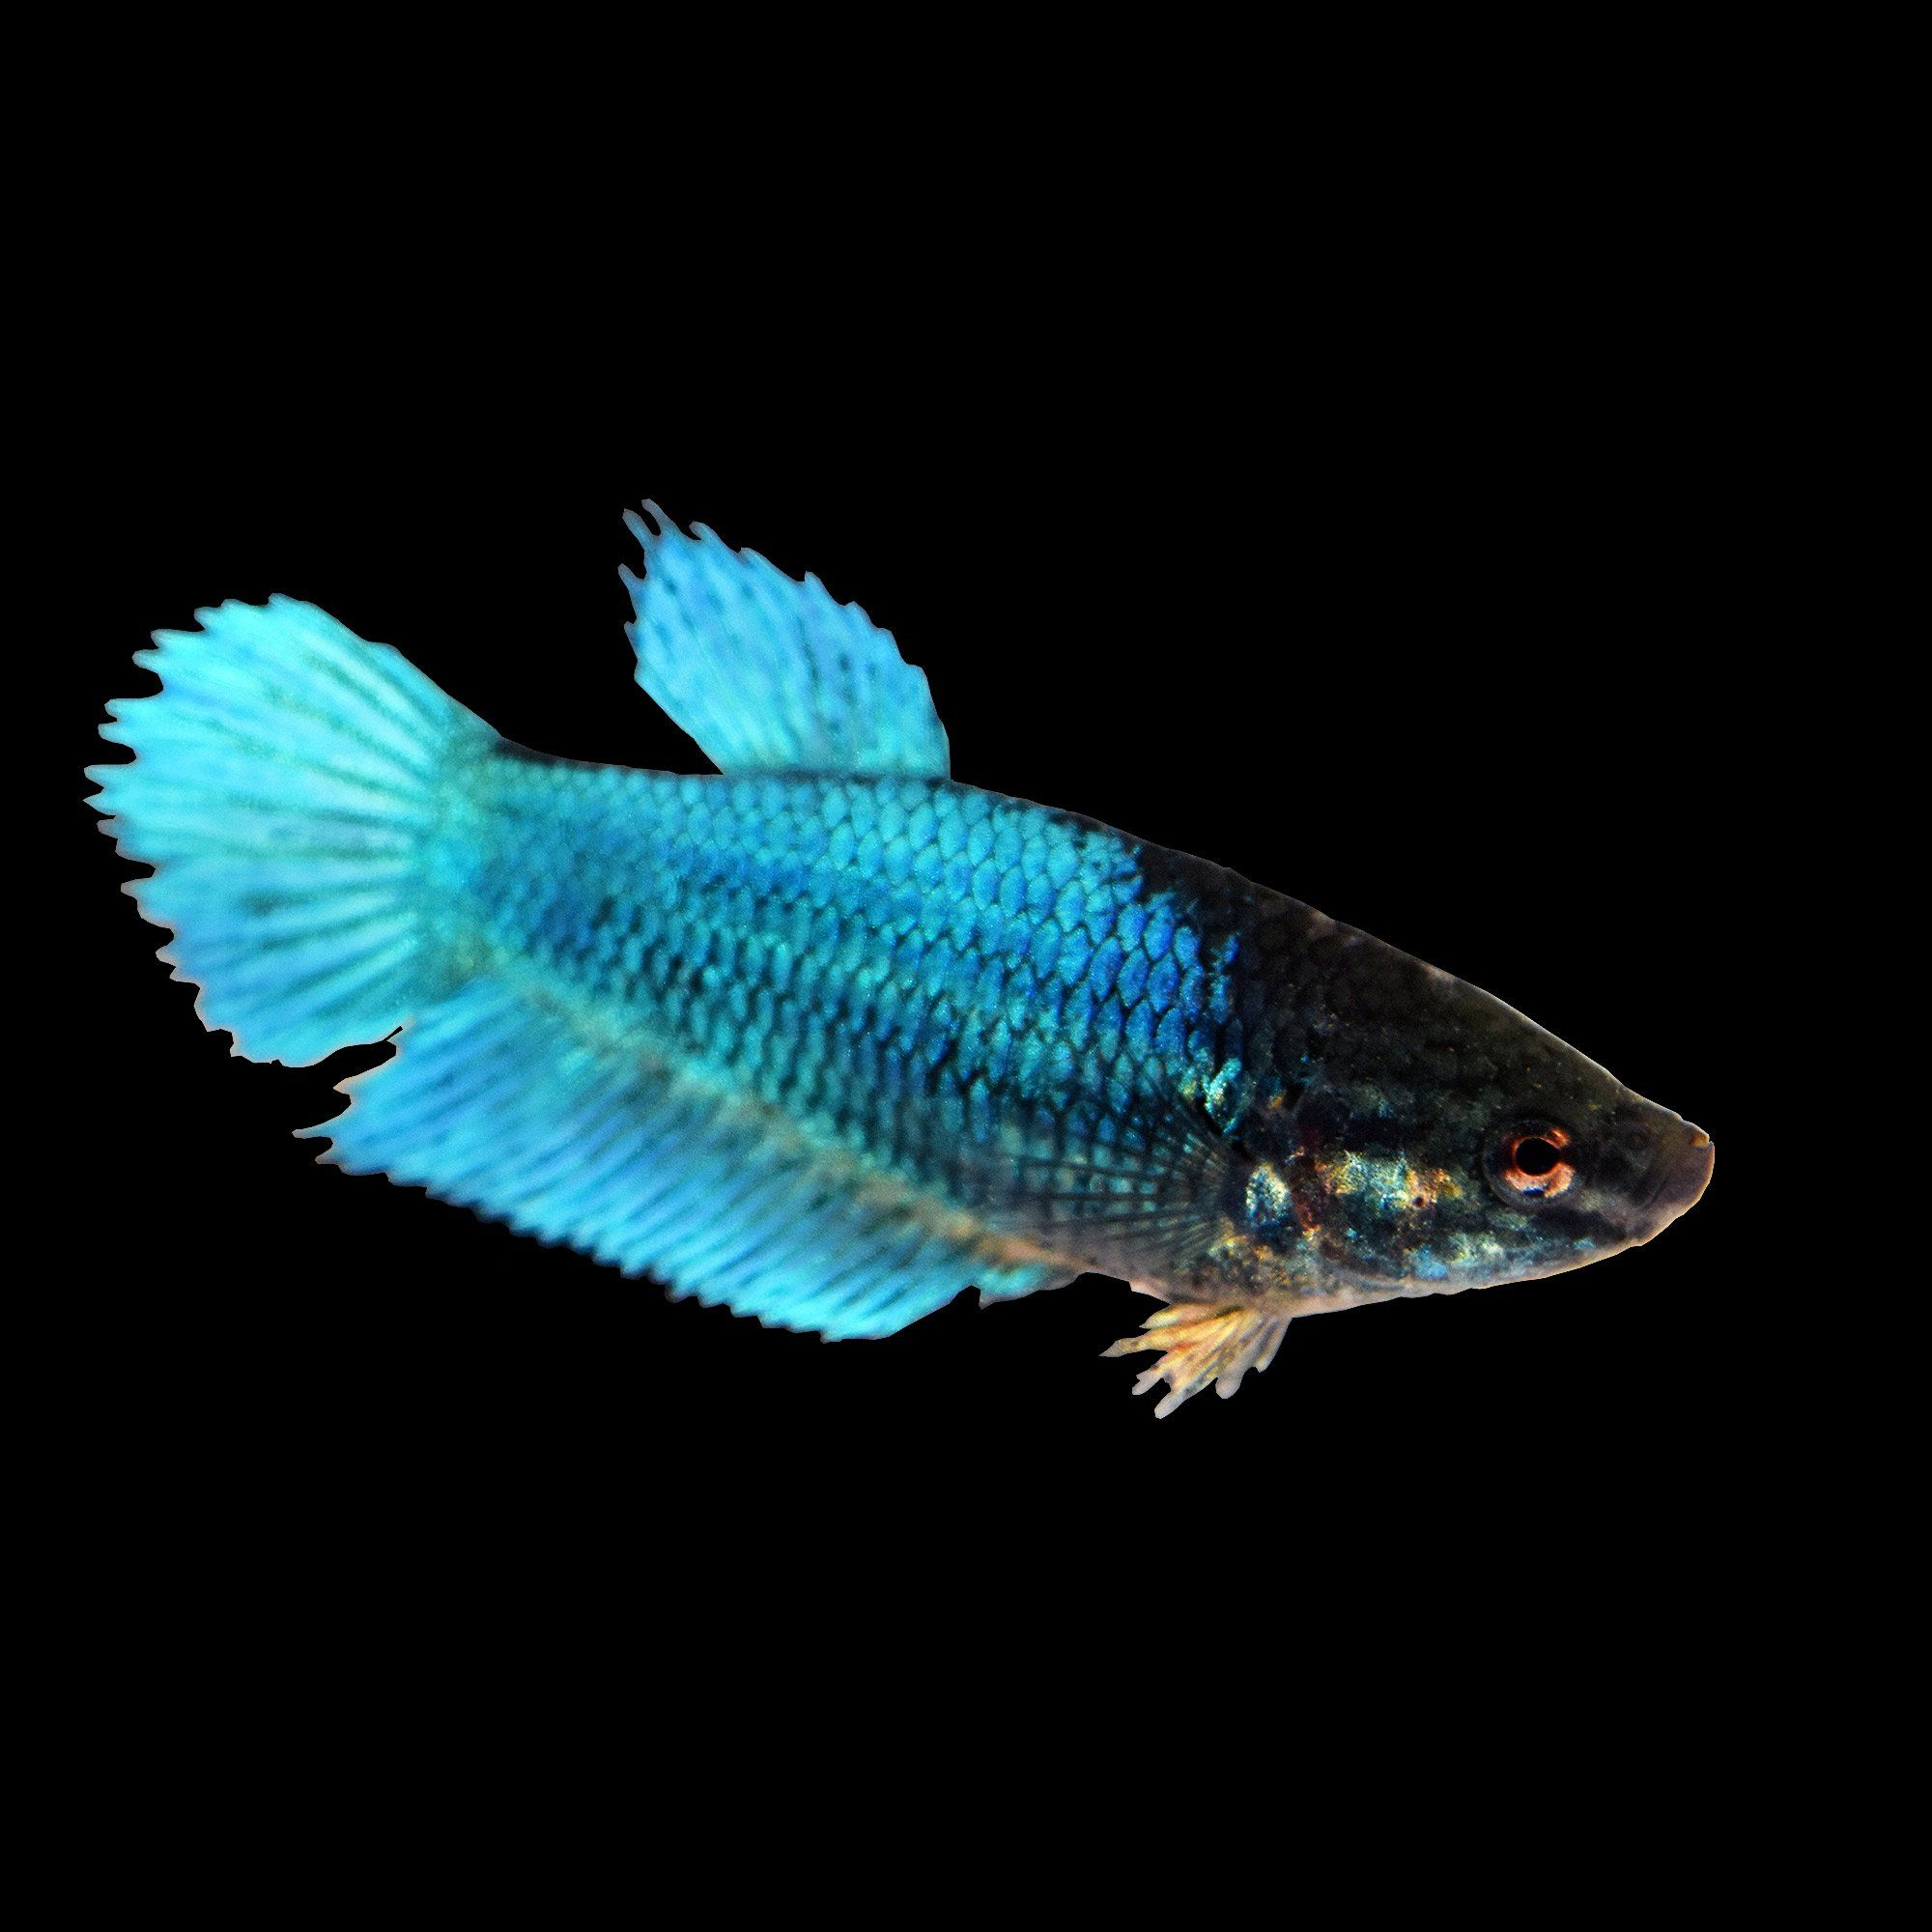 Blue female veiltail betta betta siamese fighting fish and blue female veiltail betta sciox Image collections